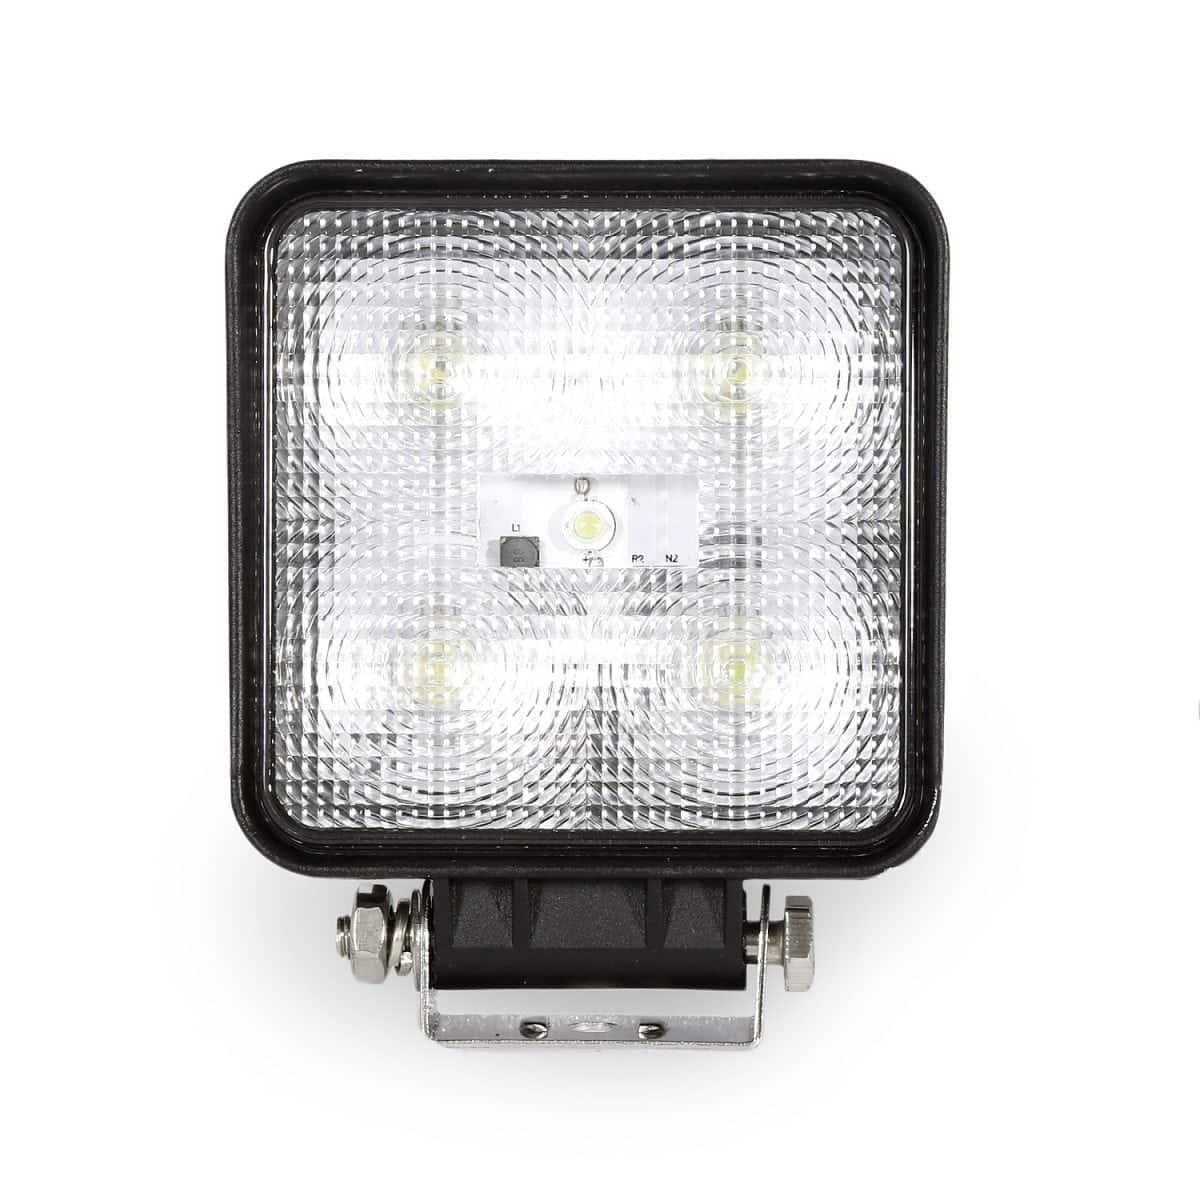 Off road led light bars for trucks led equipped vulture 15 watt led work lights aloadofball Image collections